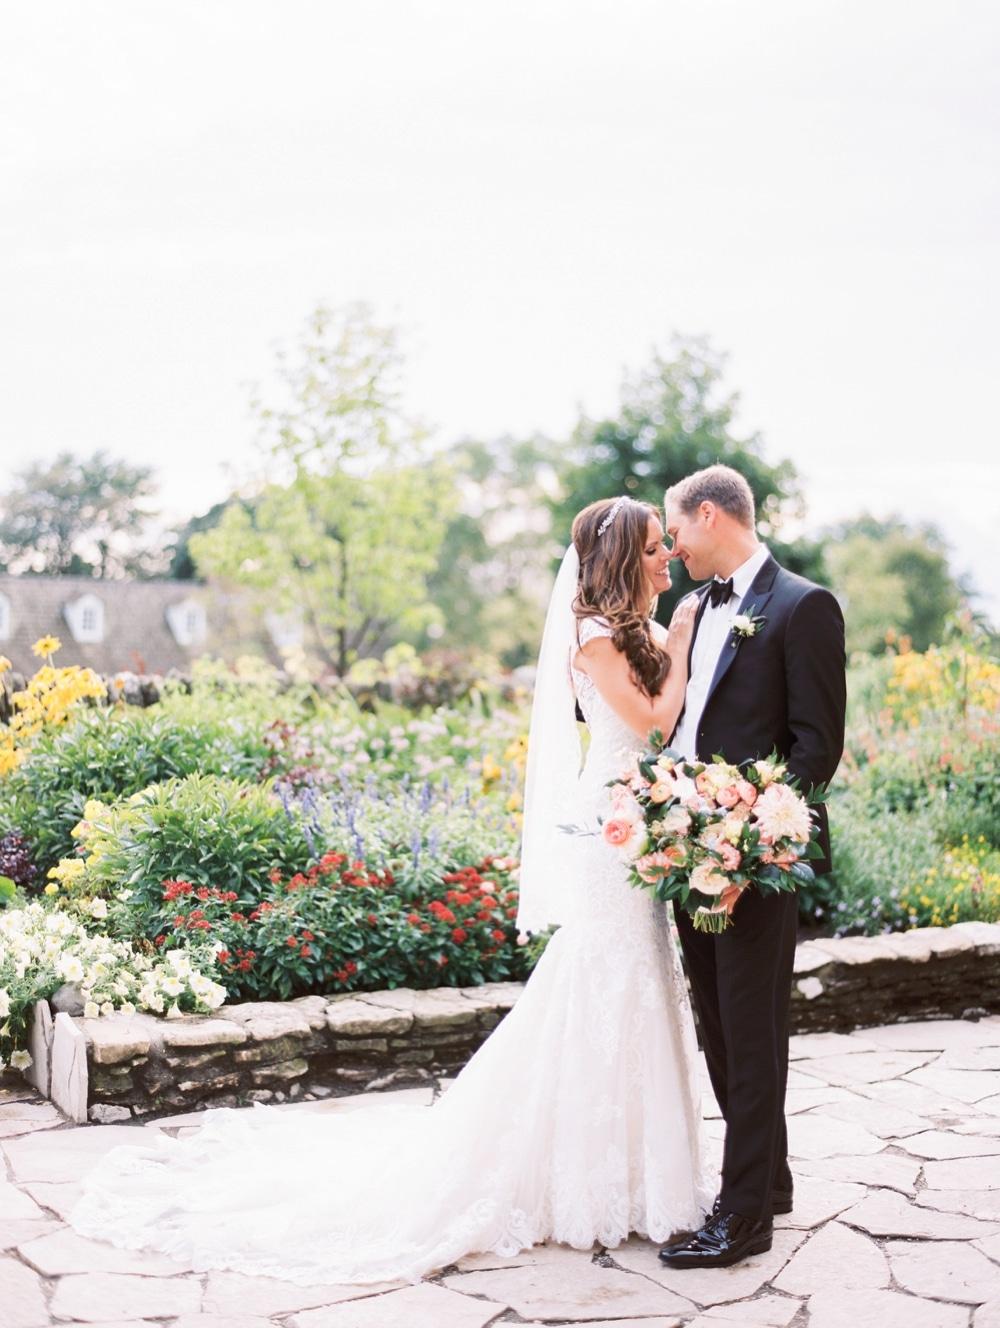 kristin-la-voie-photography-henry-ford-museum-detroit-wedding-photographer-135